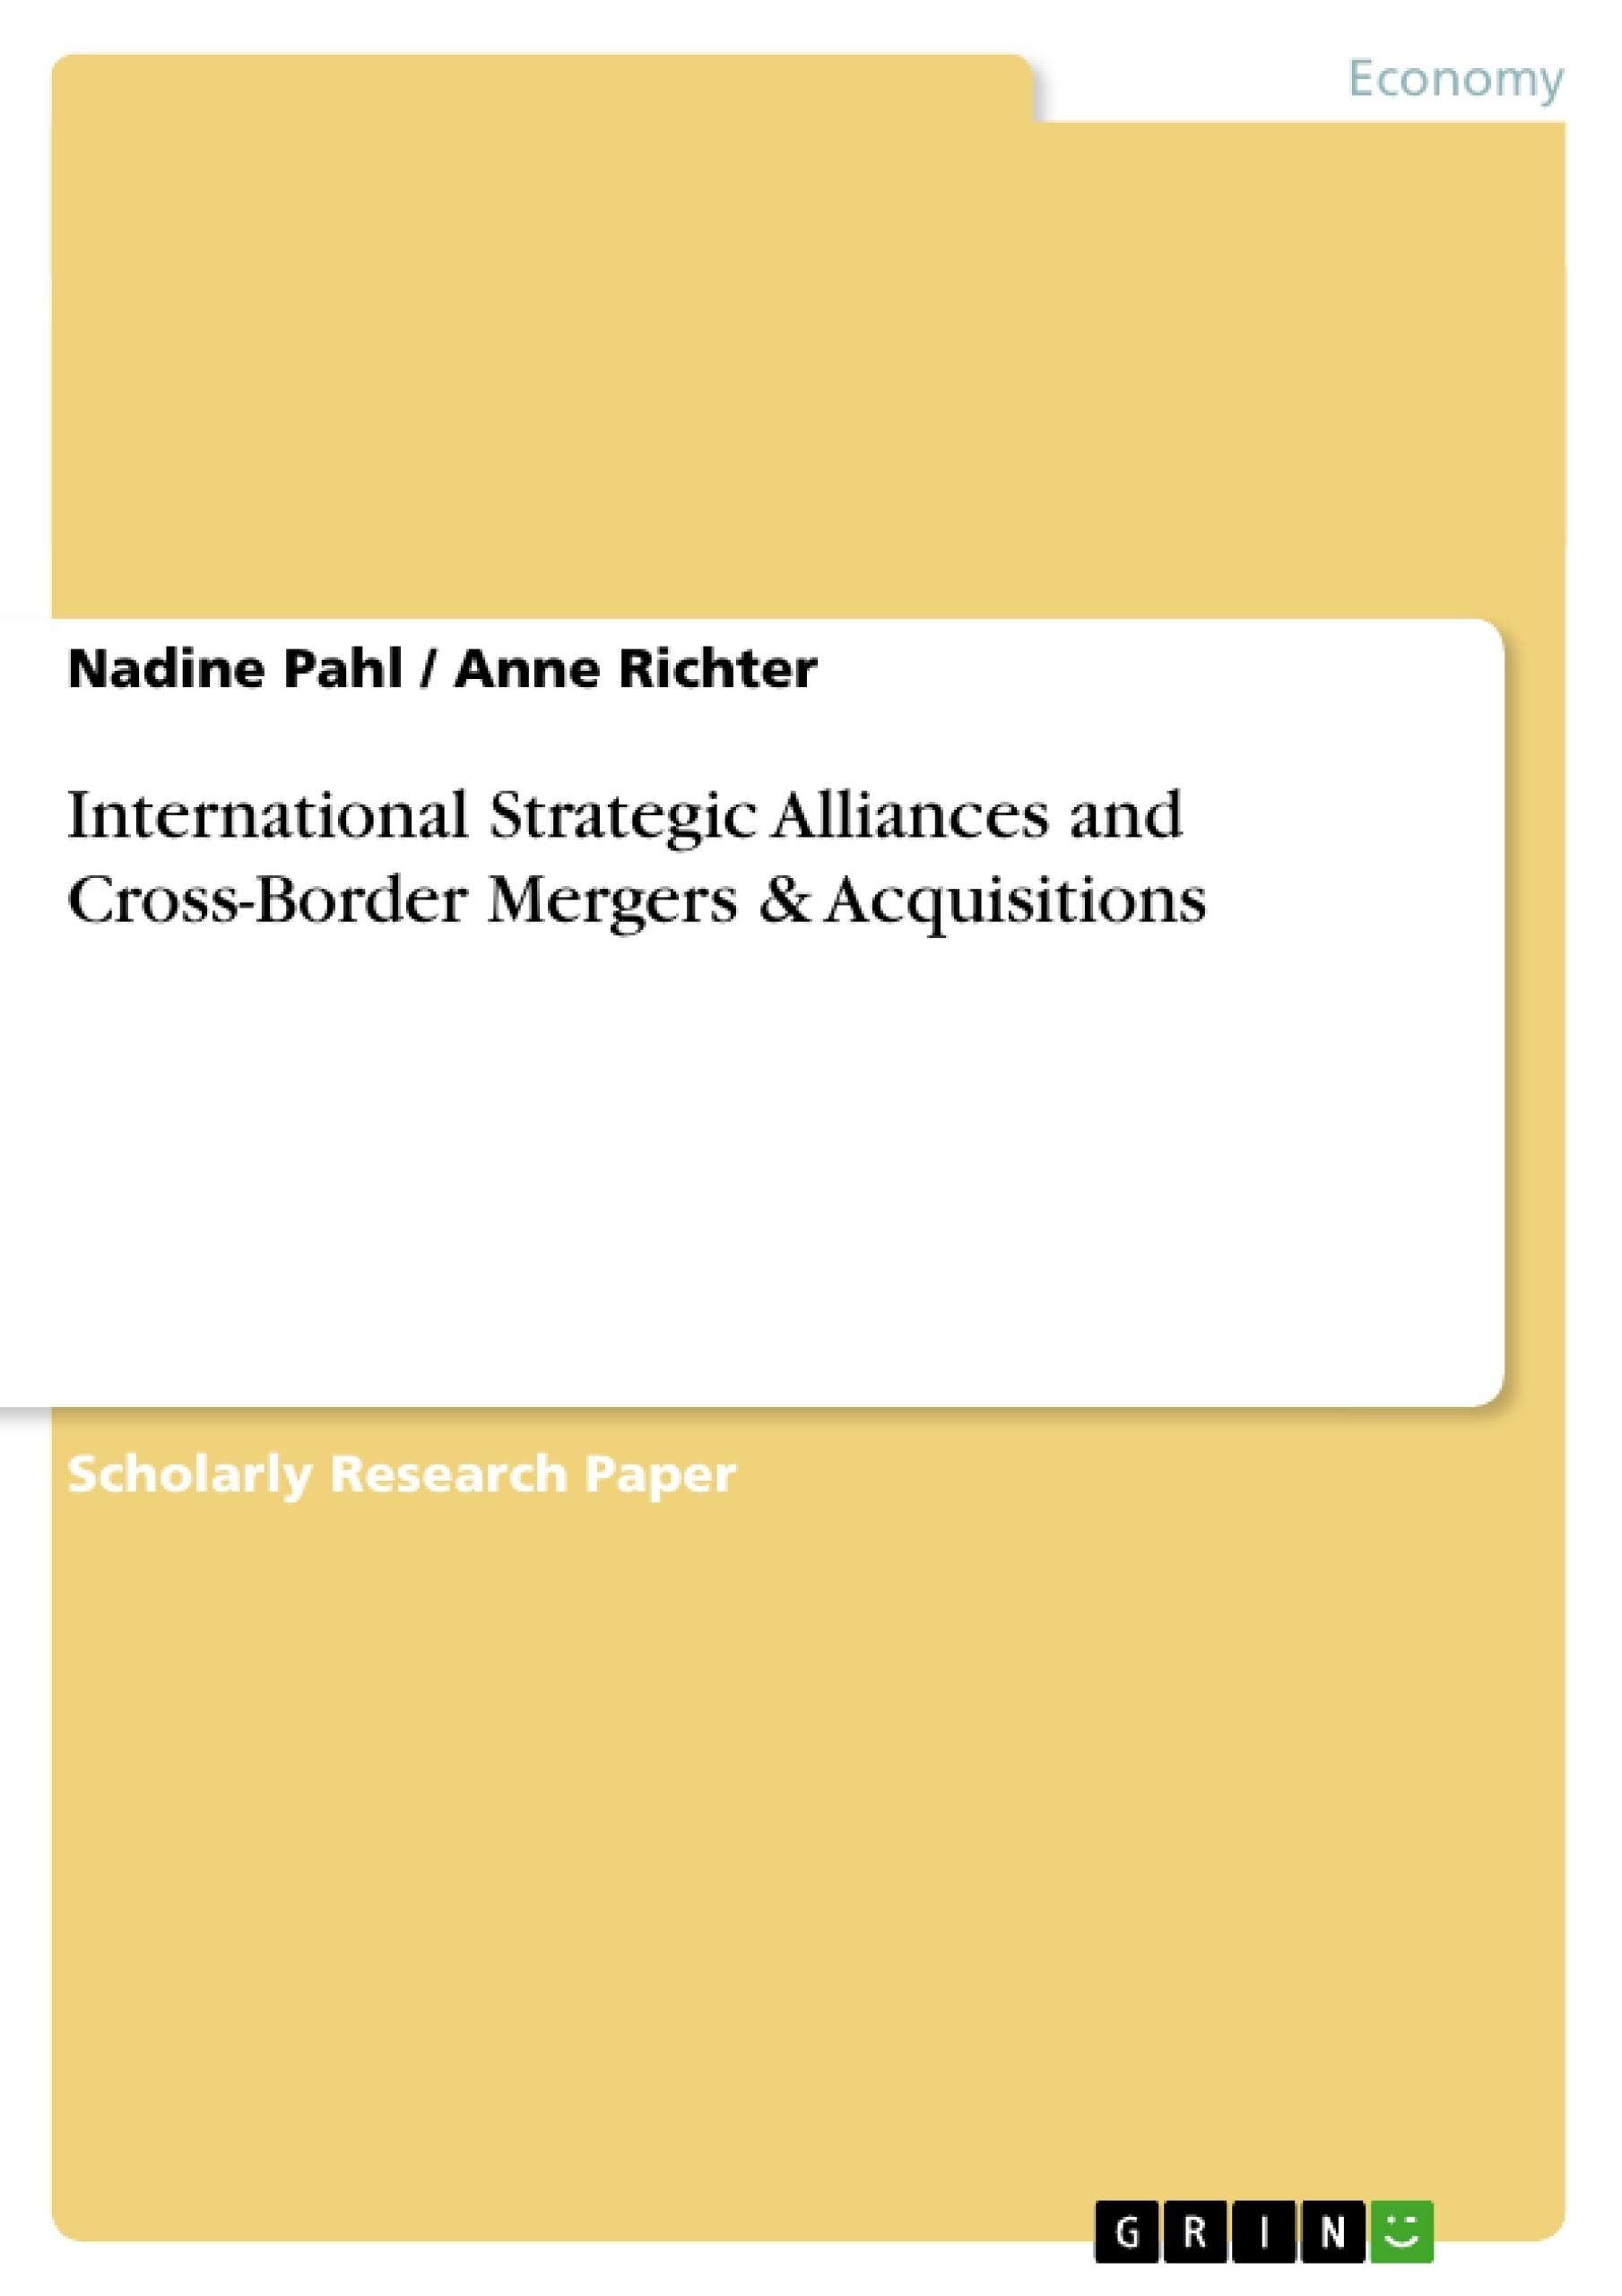 Title: International Strategic Alliances and Cross-Border Mergers & Acquisitions